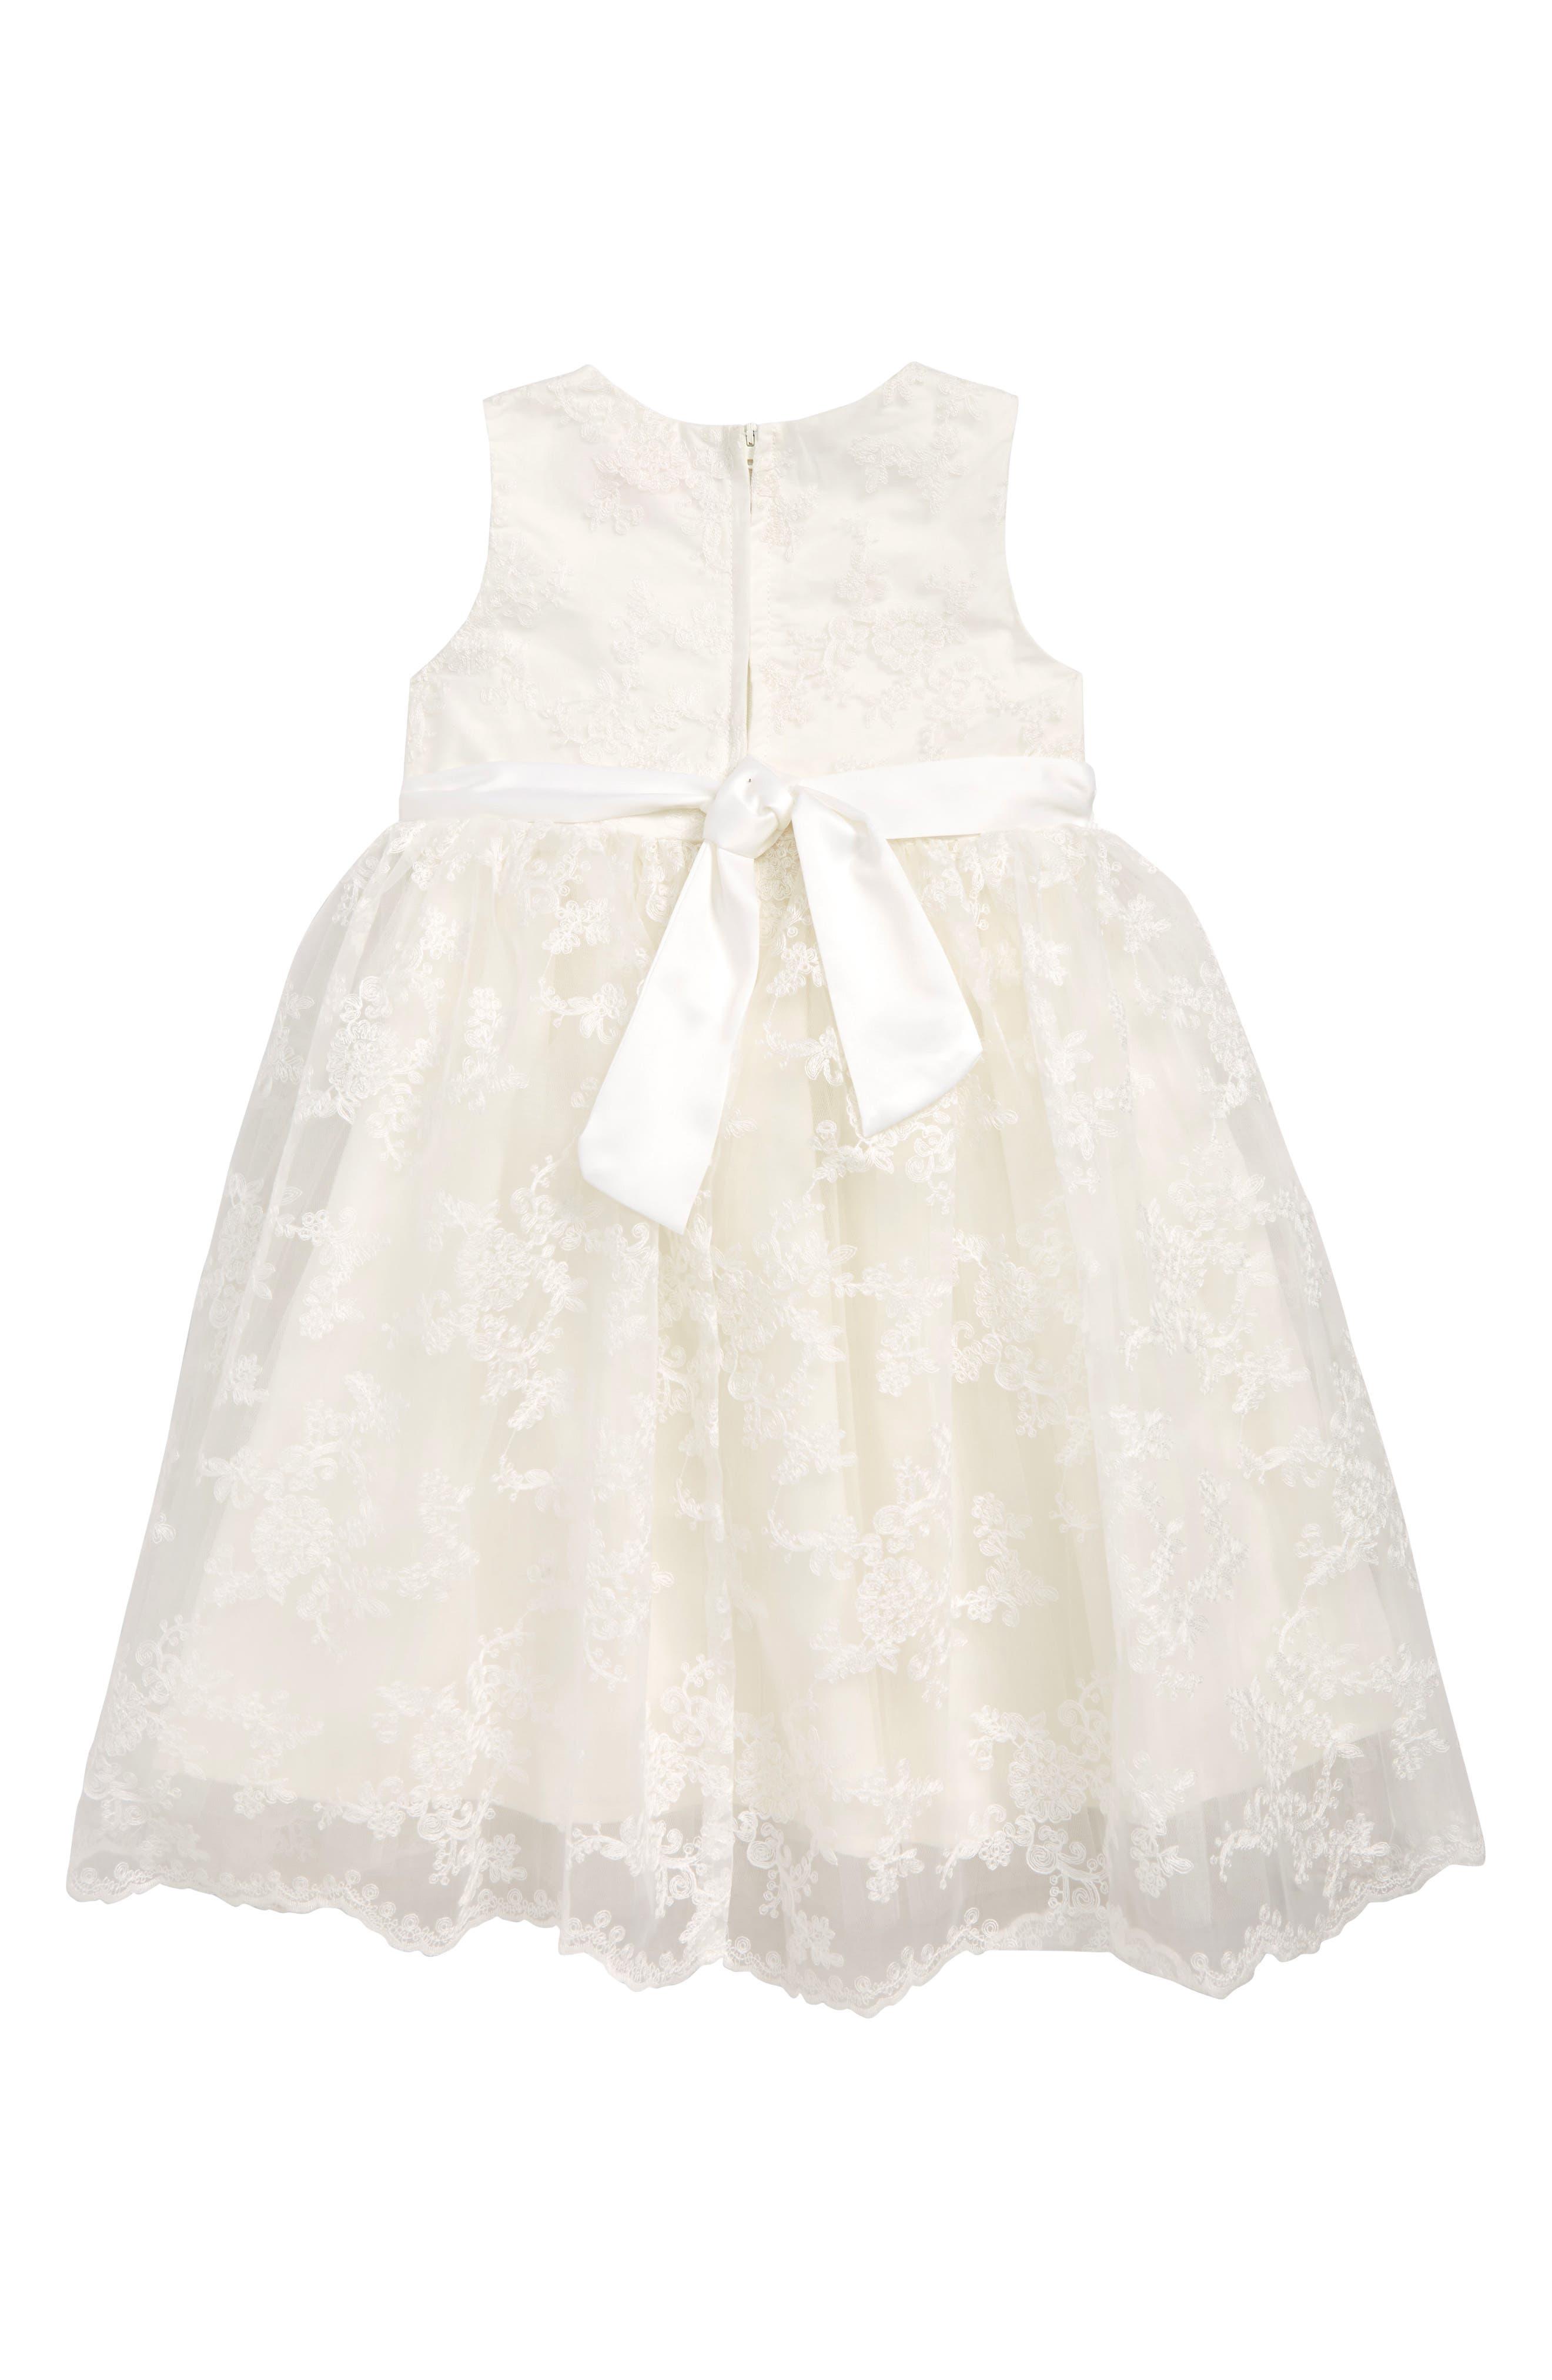 POPATU Embroidered Dress, Main, color, WHITE